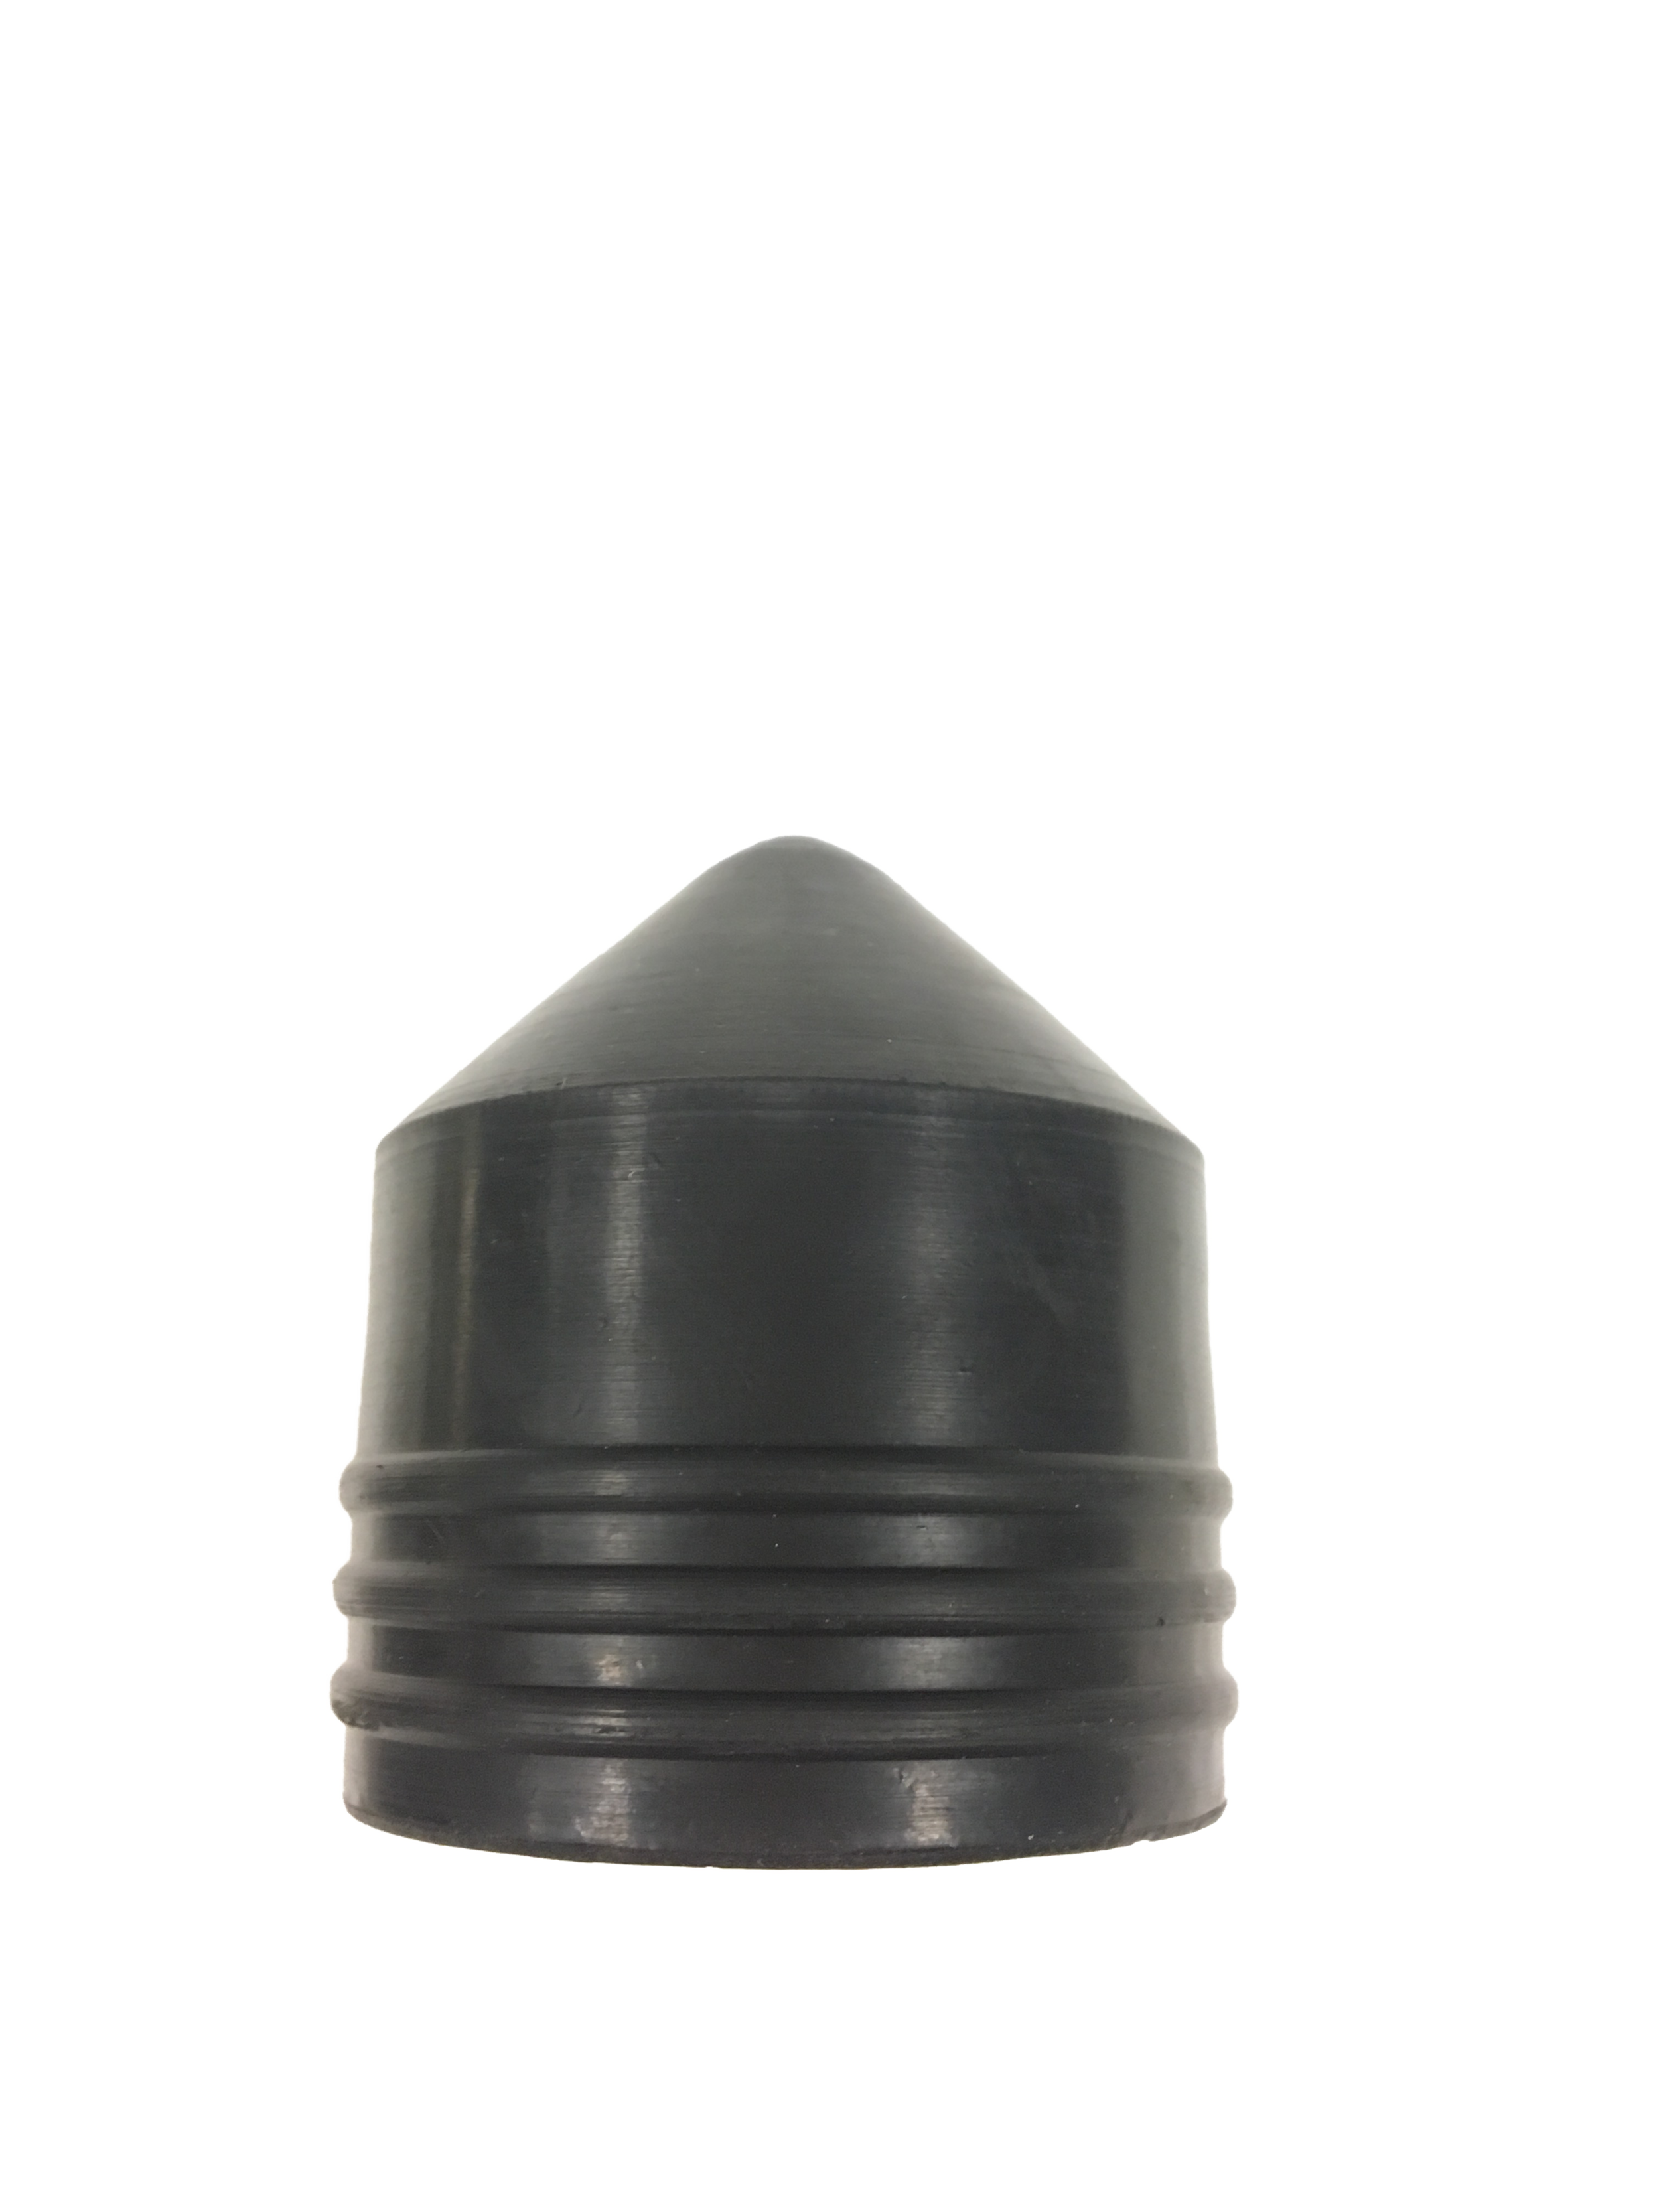 54mm gummi.png